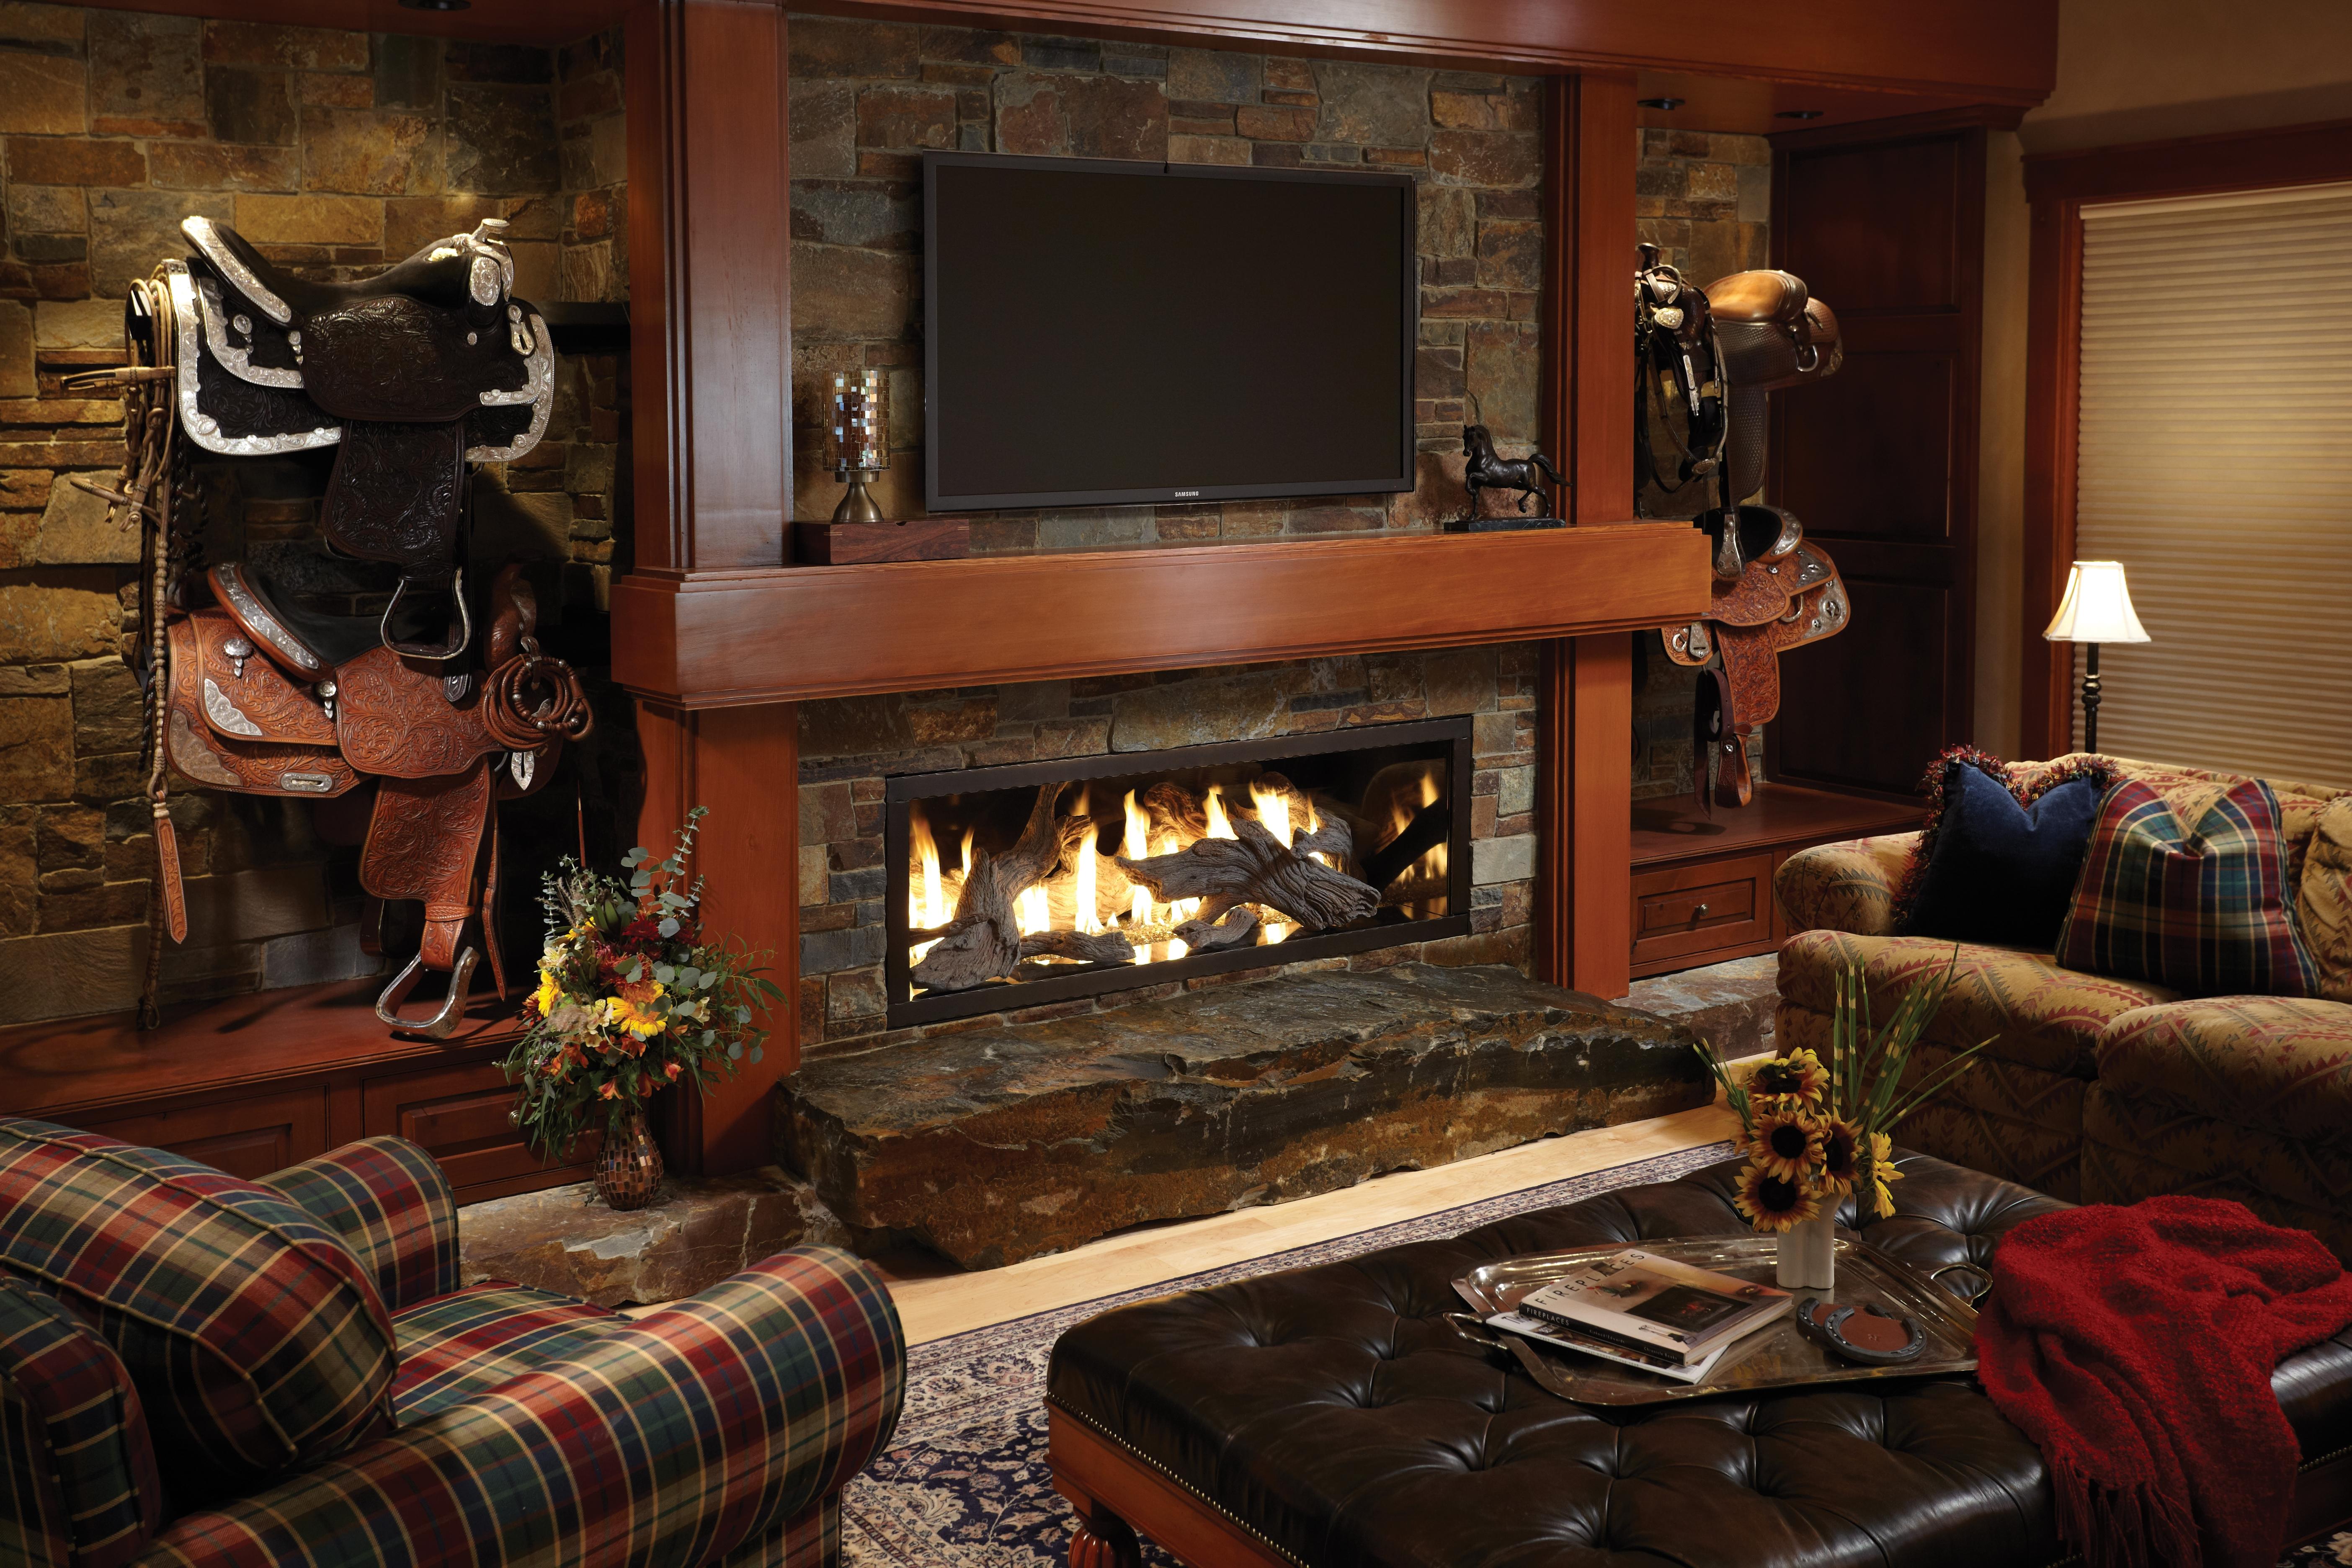 Lisacs Fireplace Elegant Lisac S Fireplaces and Stoves Portland oregon